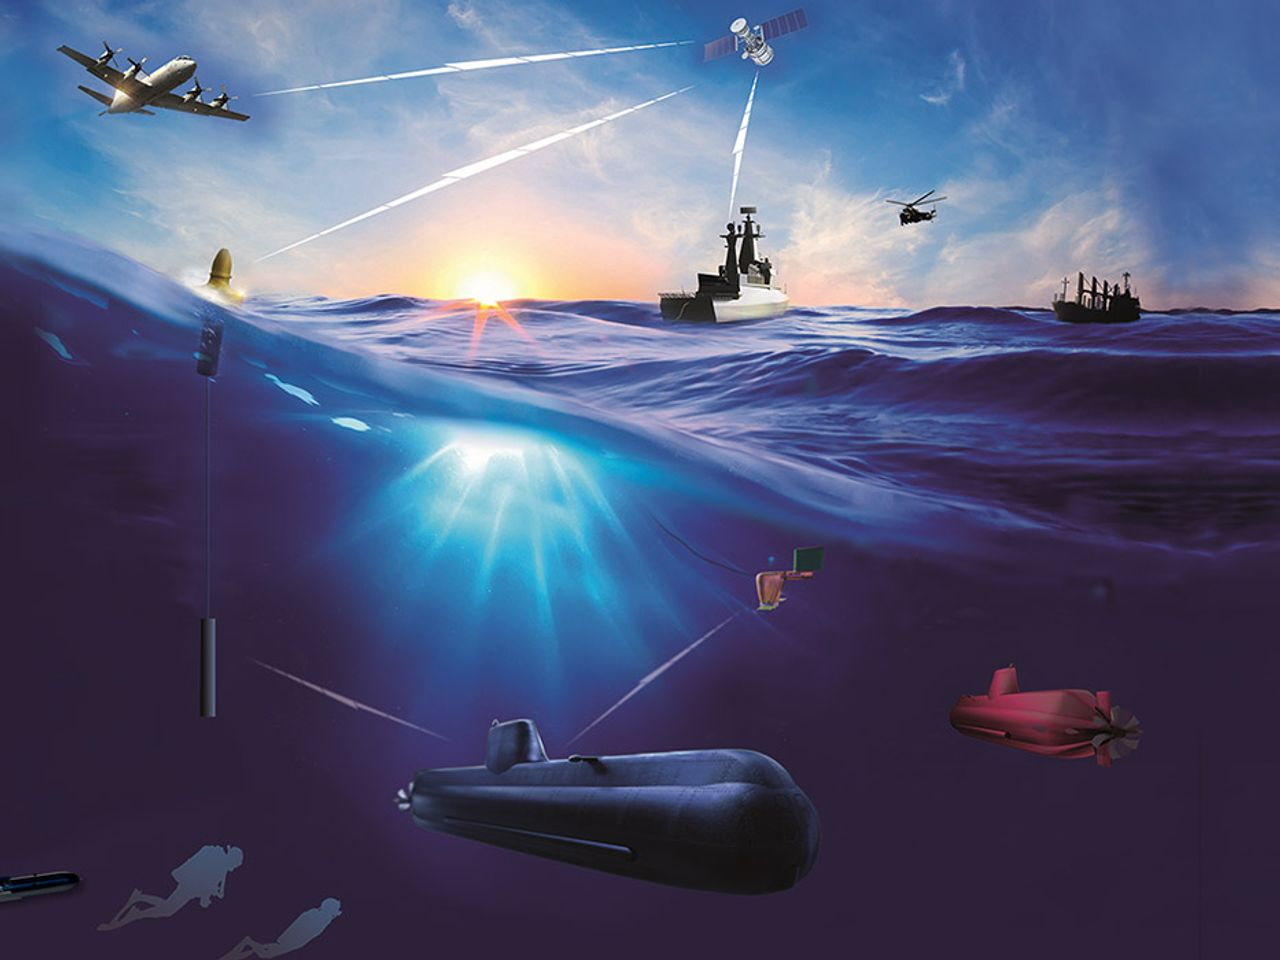 Digital underwater communication in maritime shipbuilding.